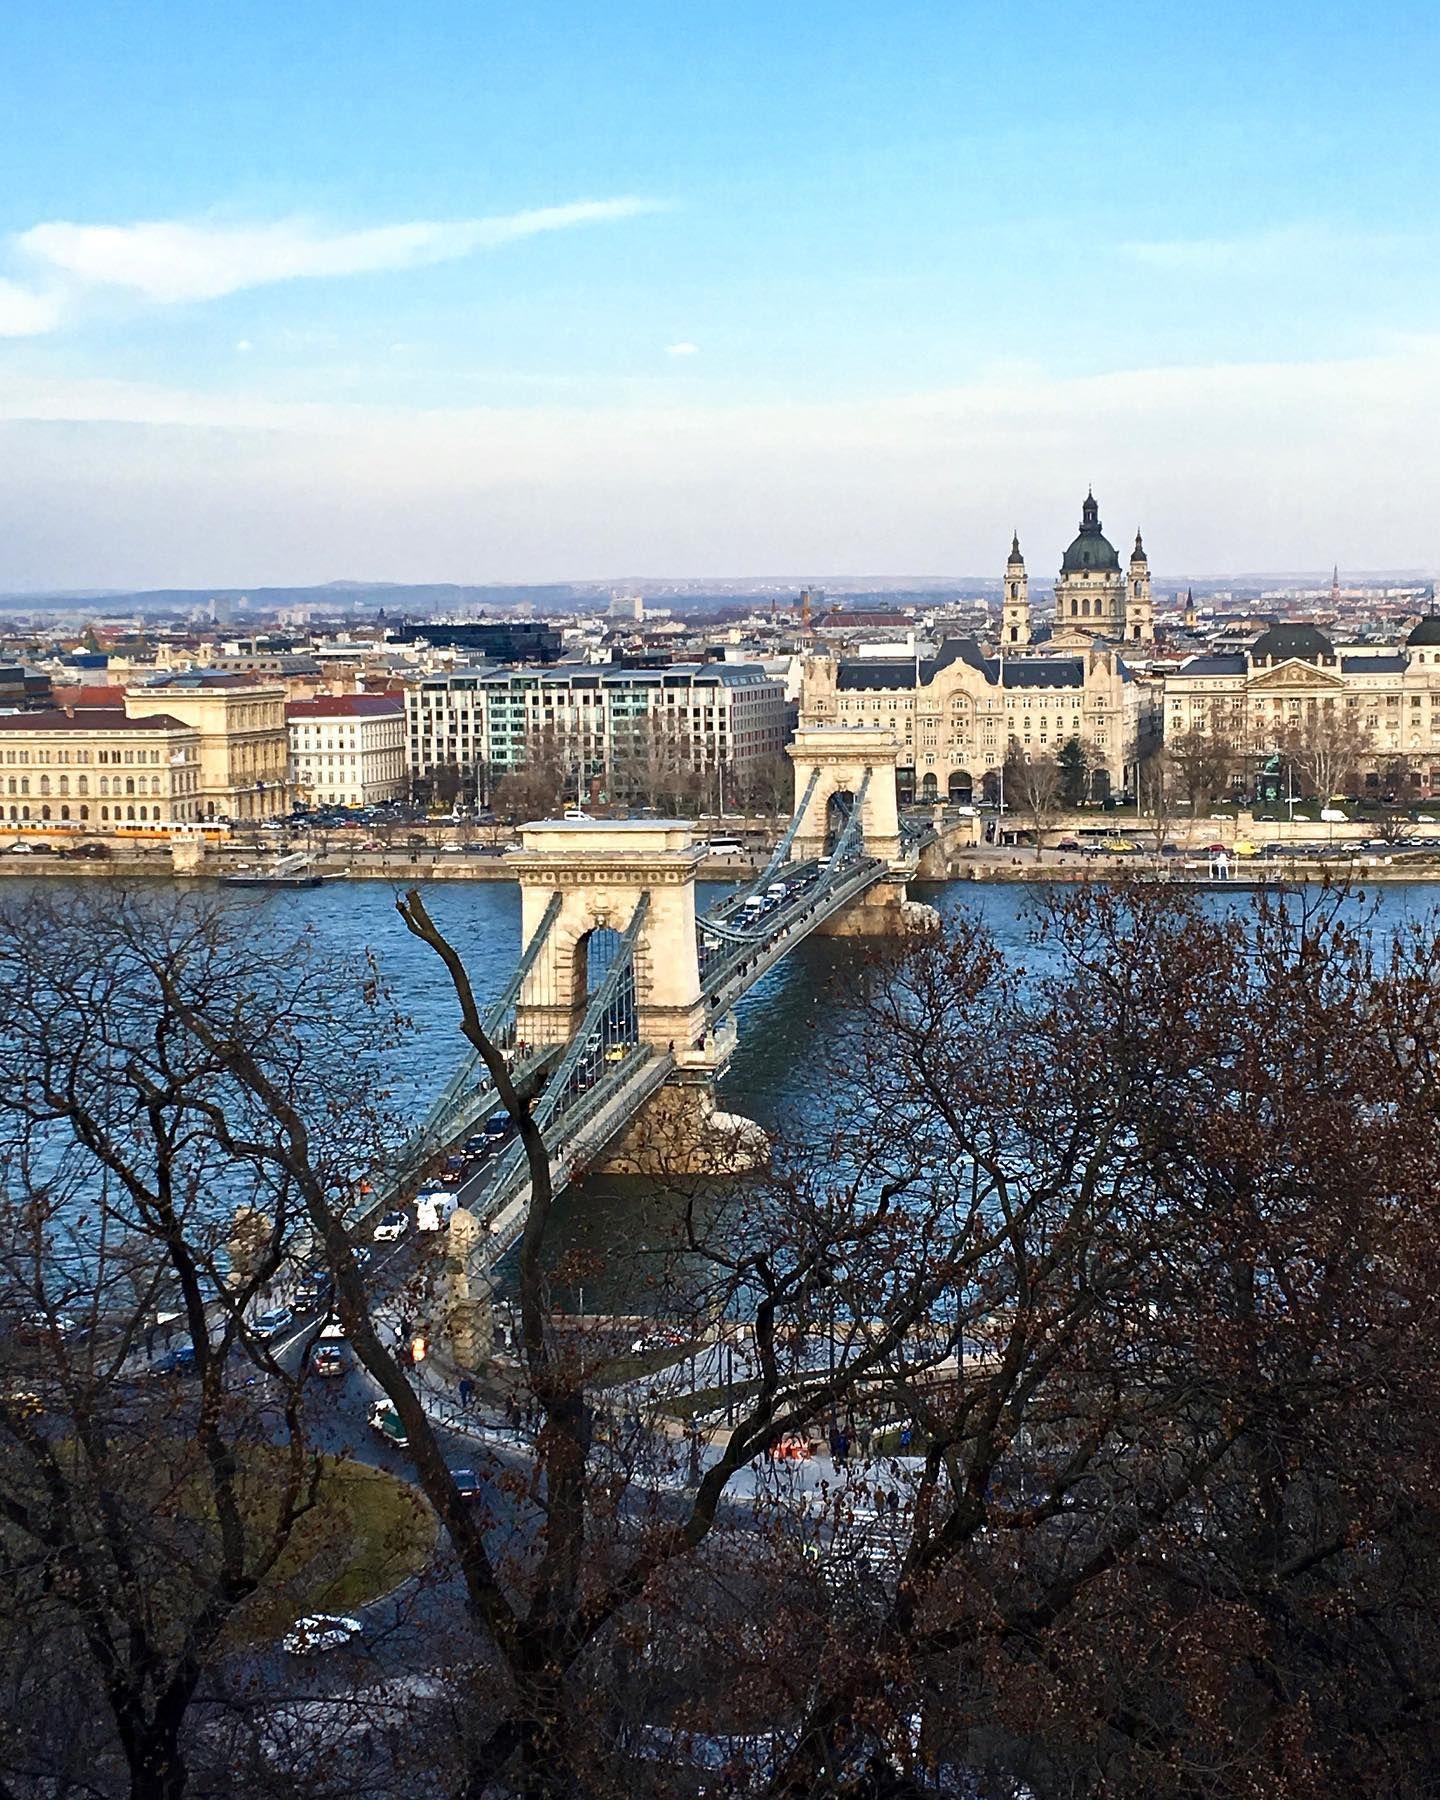 El Puente De Las Cadenas En Budapest Hungría Budapest Hungary Danube River Budapest